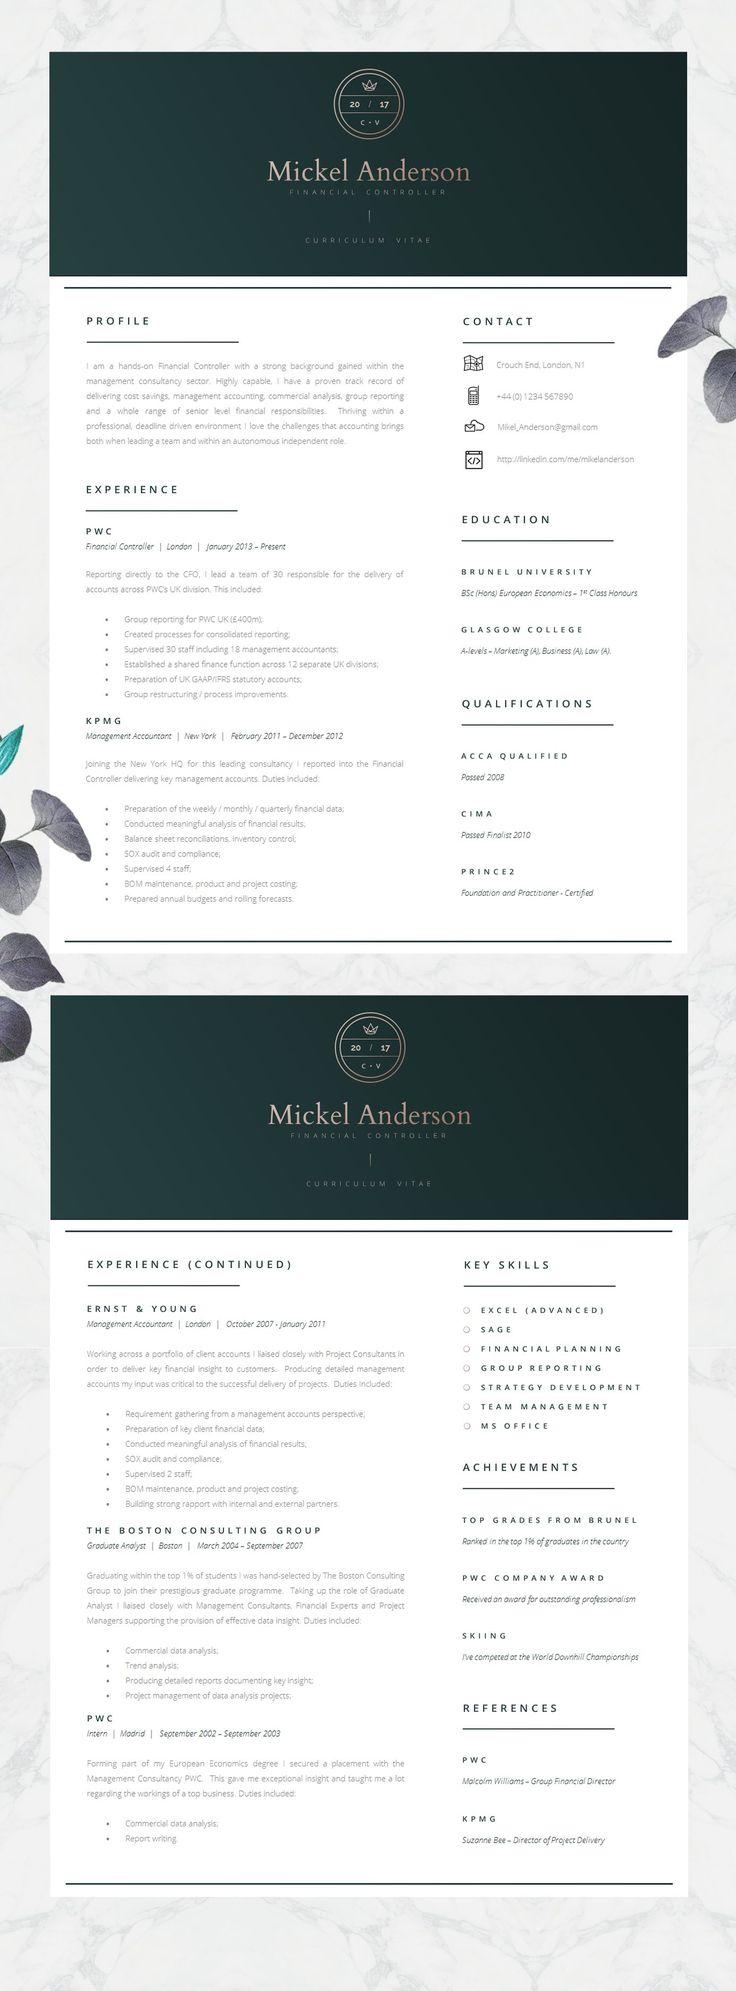 Professional Resume Template | Resume Design